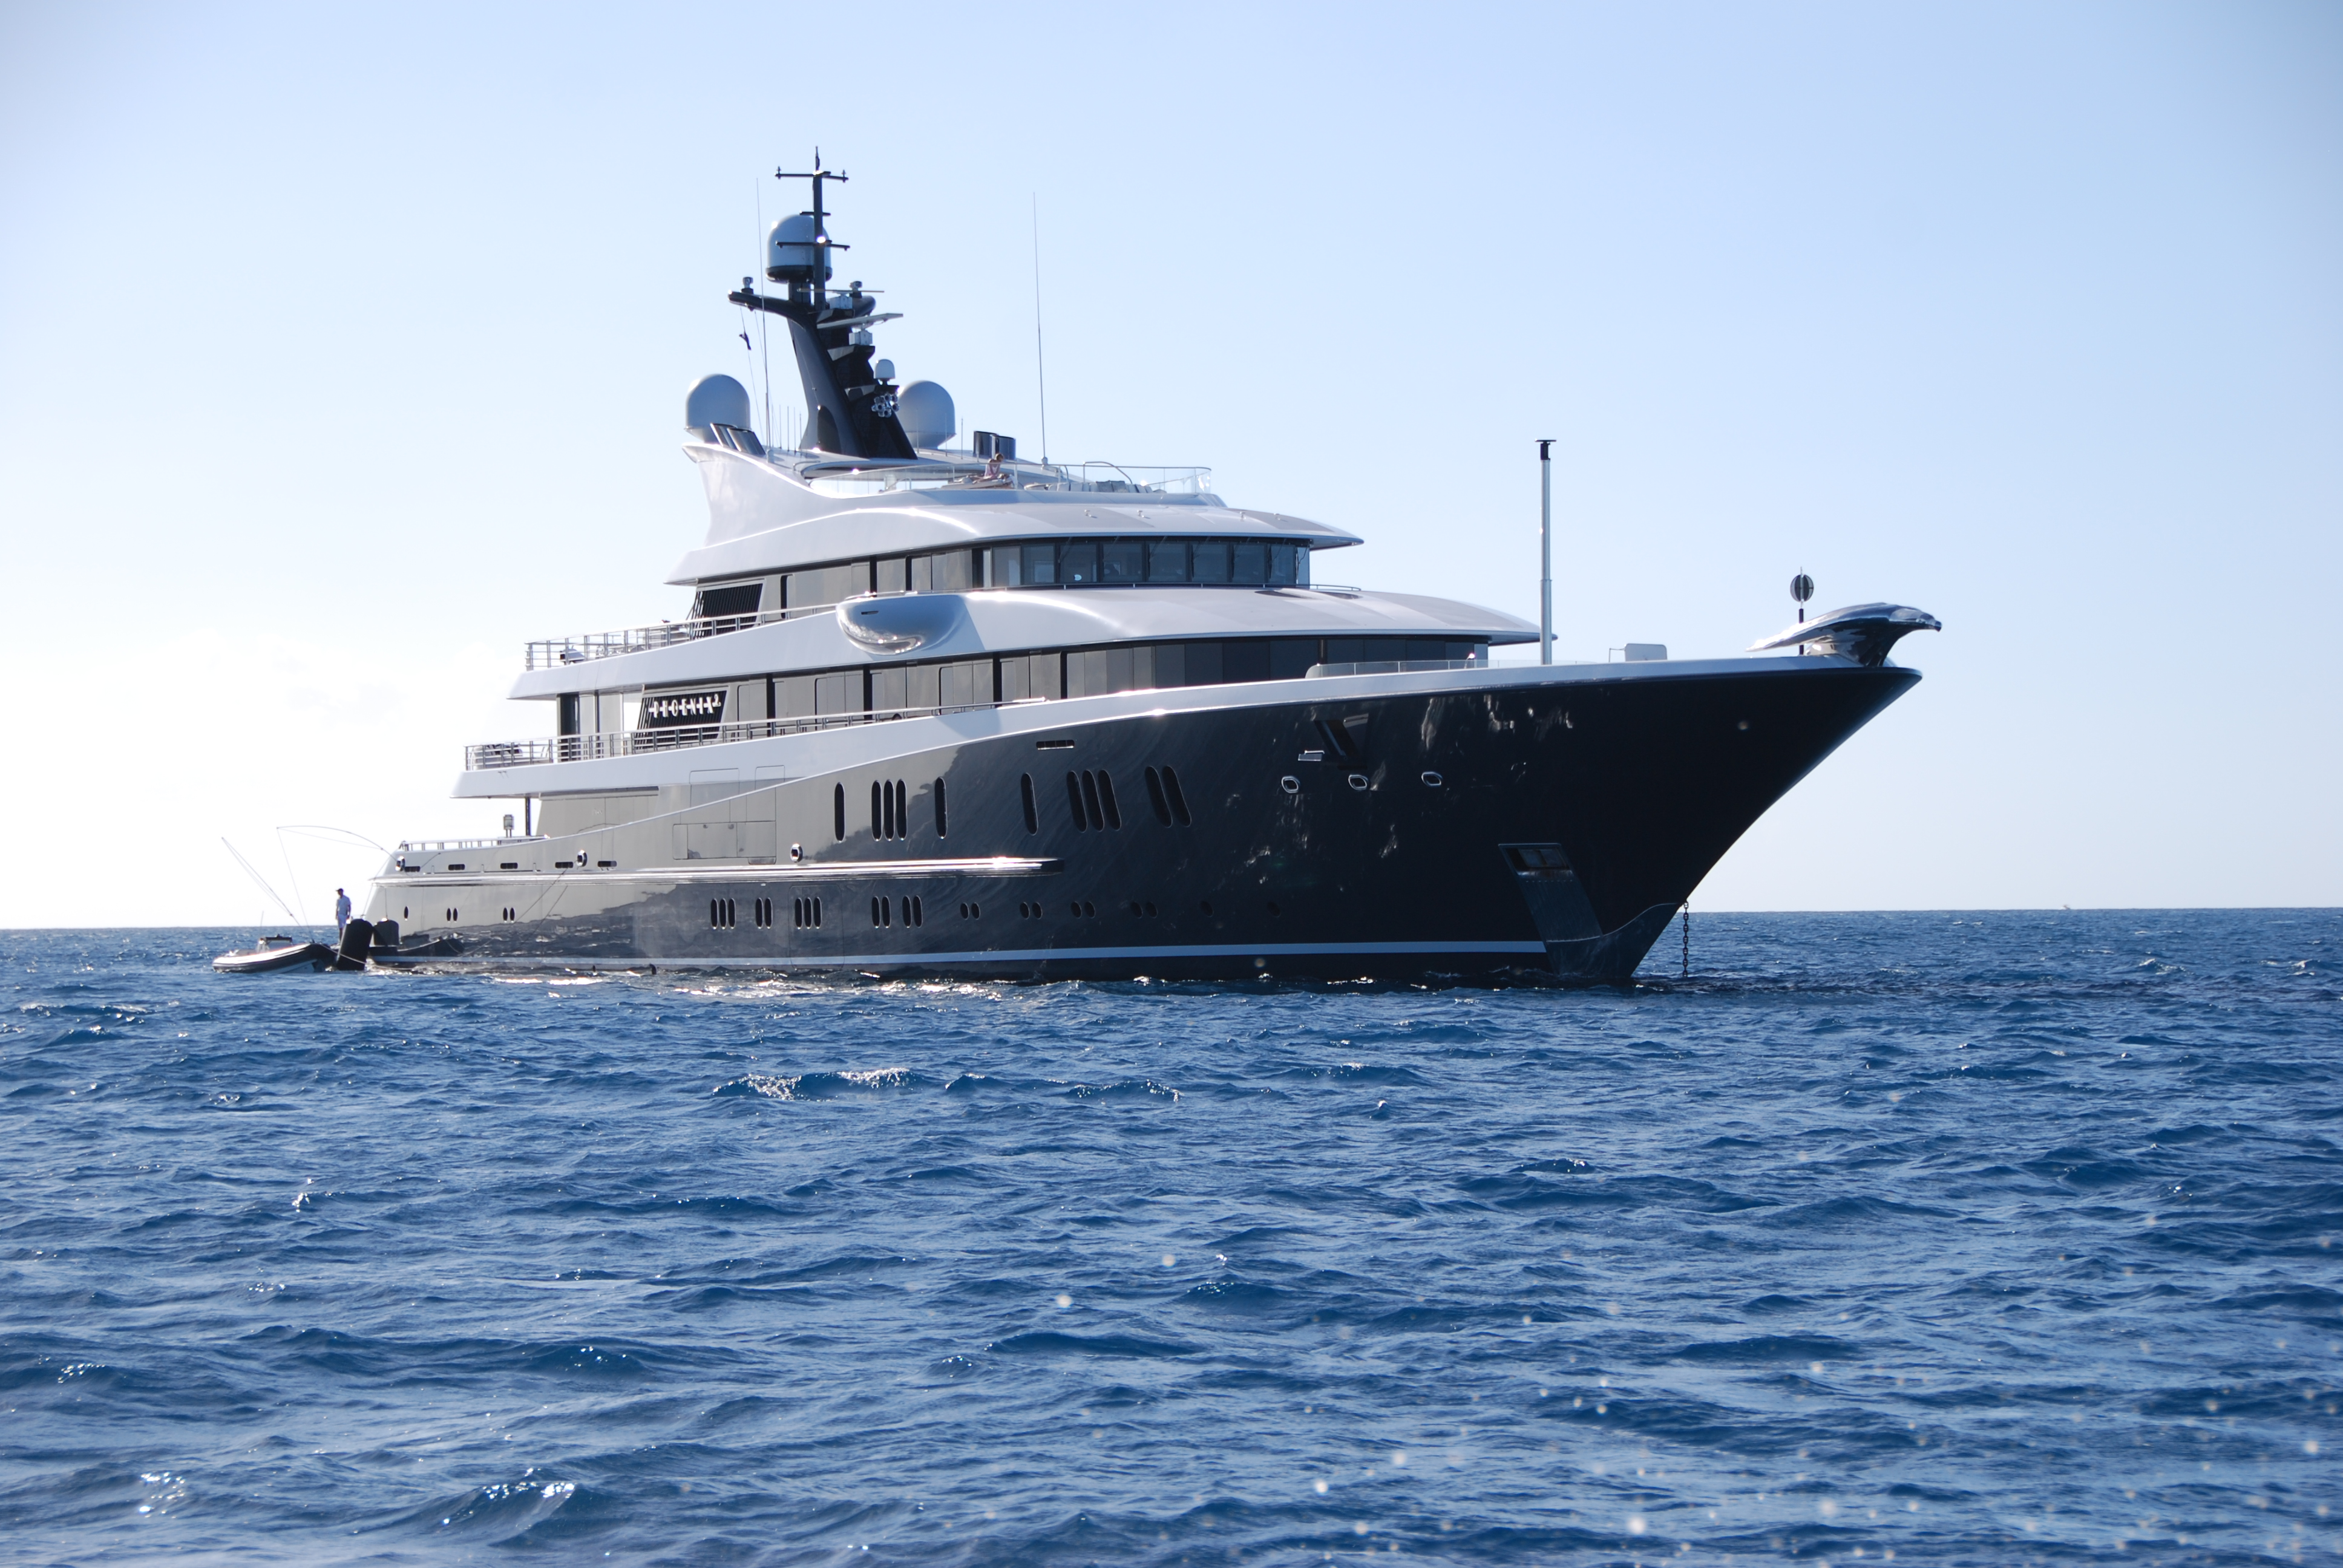 Phoenix 2 cruising in the Caribbean